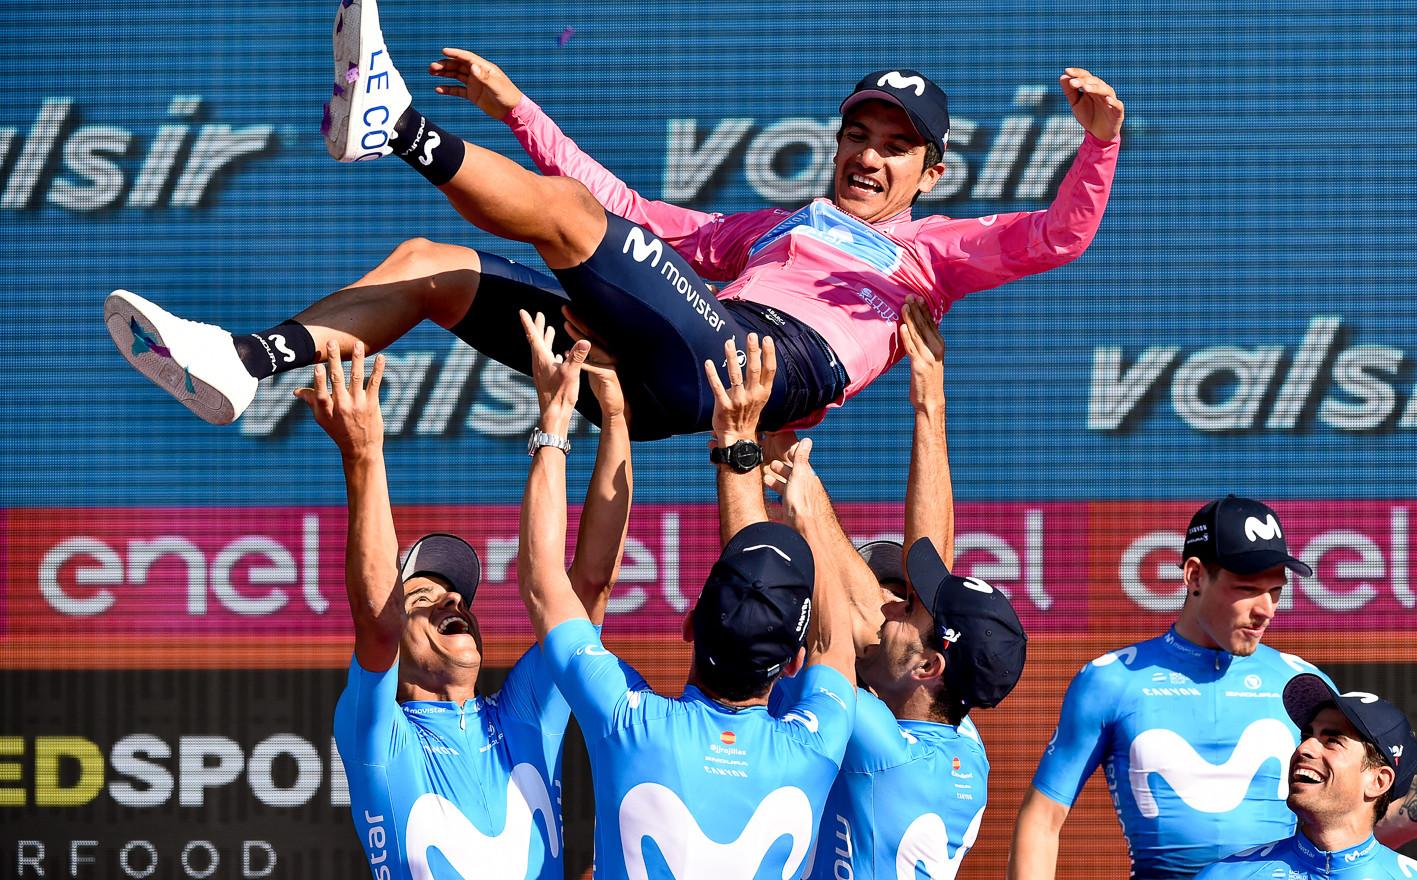 Richard Carapaz (ECU/Movistar) wins the Giro d'Italia 2019.